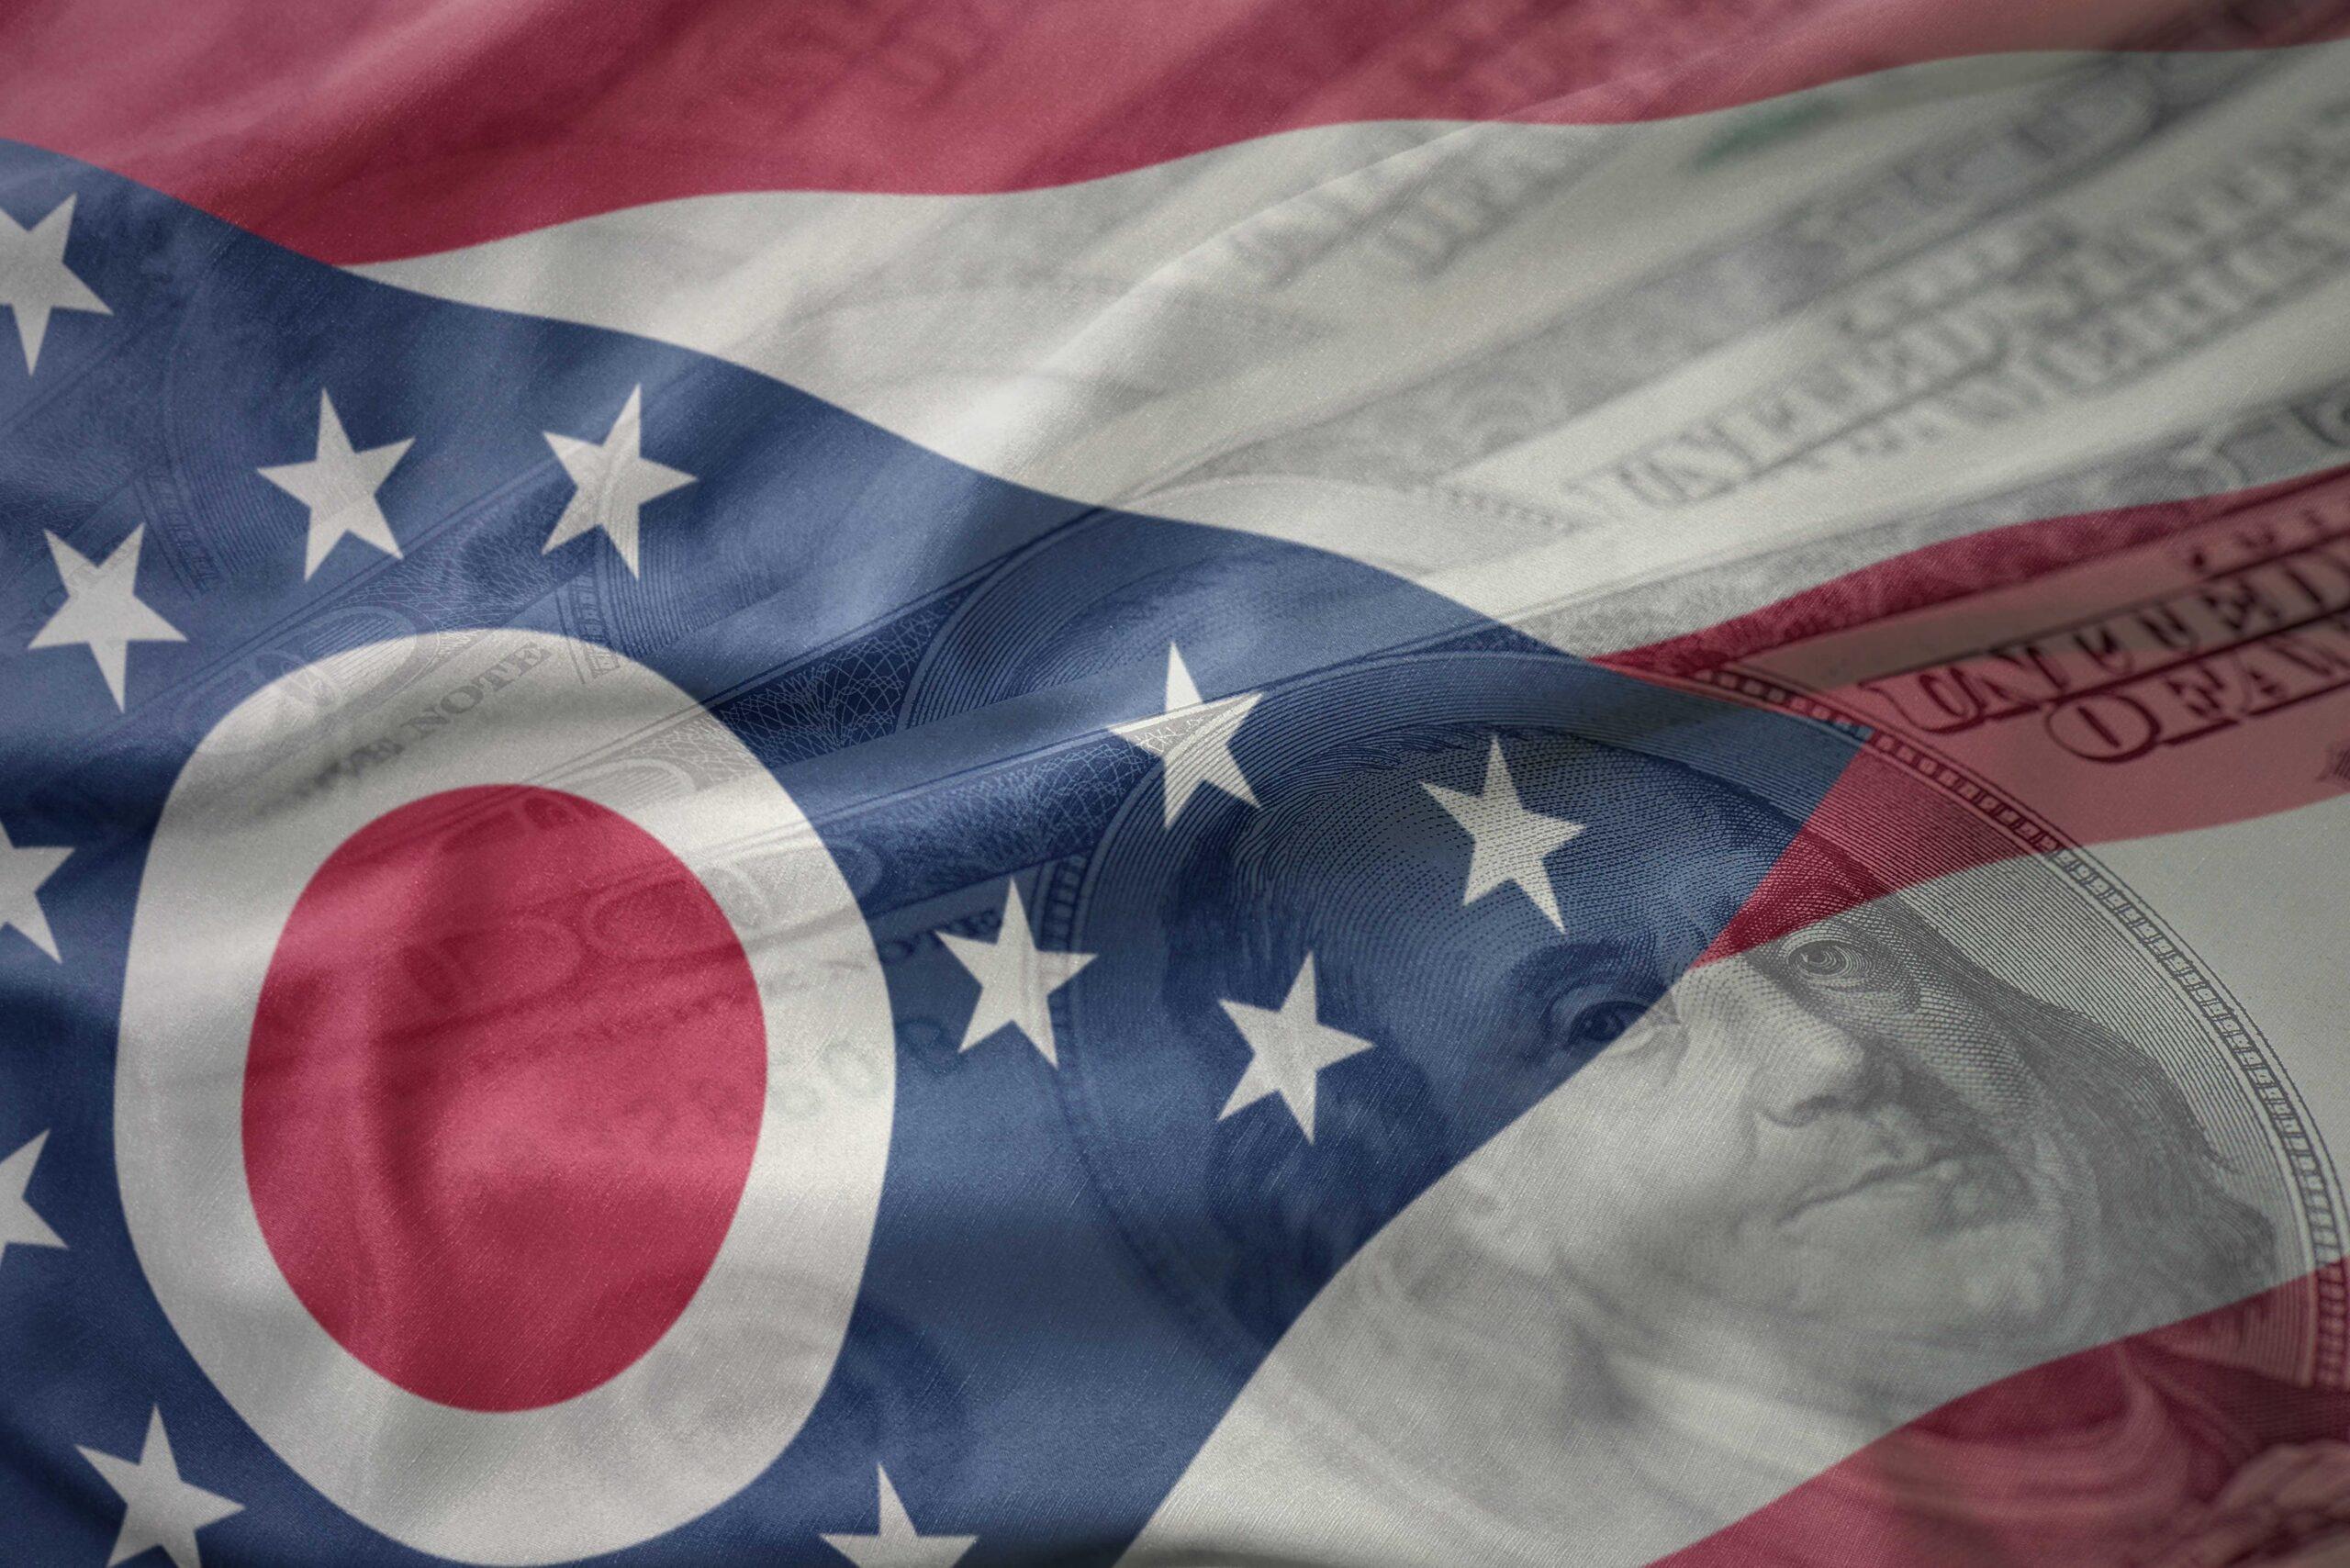 Portal for Ohio's Four Grant Programs Opens June 29, 2021